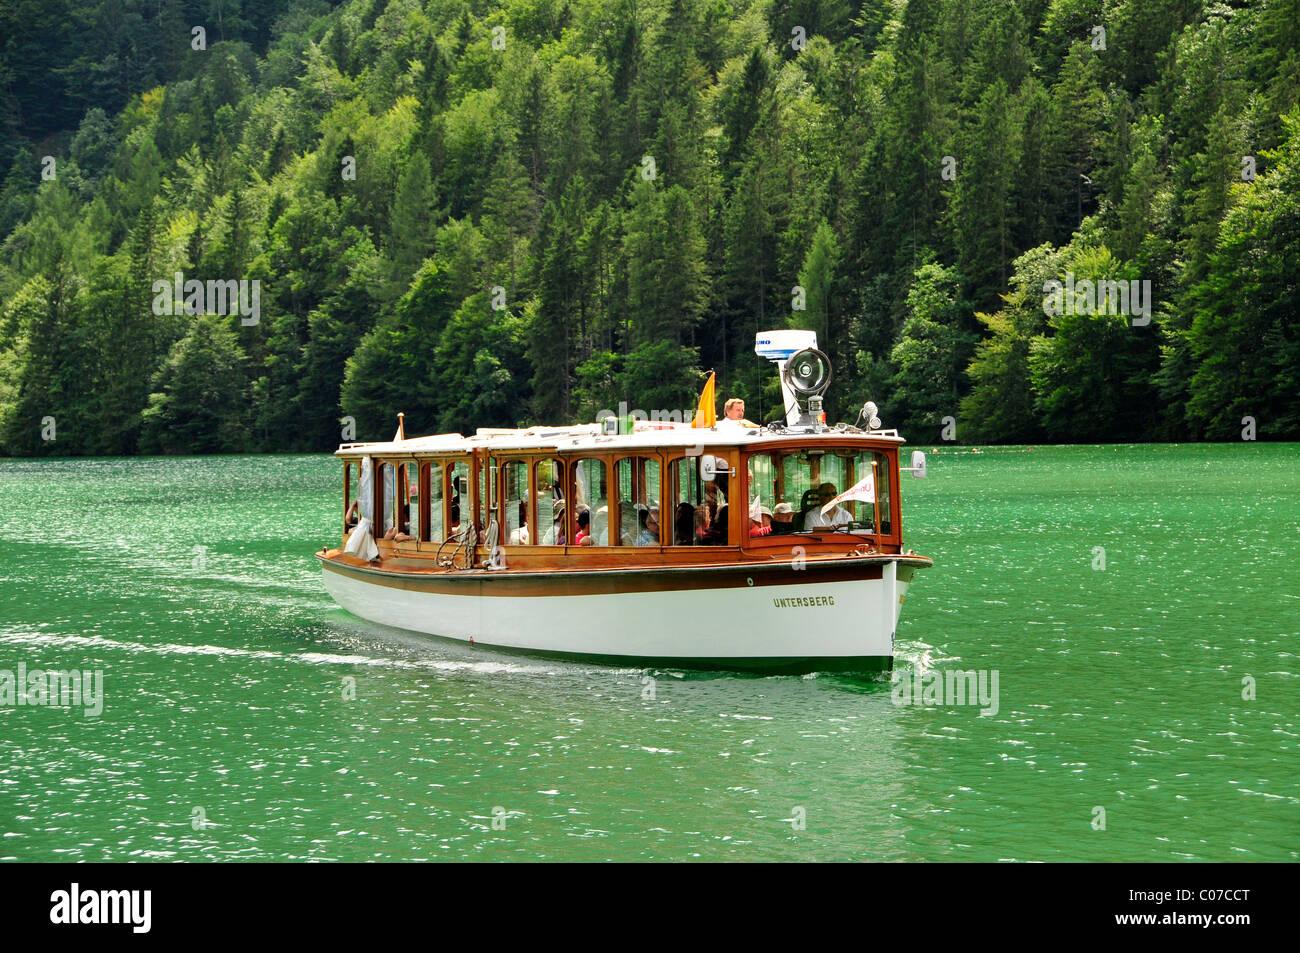 Electric boat 'Untersberg' of the Koenigssee-Schifffahrt line near Koenigssee village, Koenigssee lake, - Stock Image